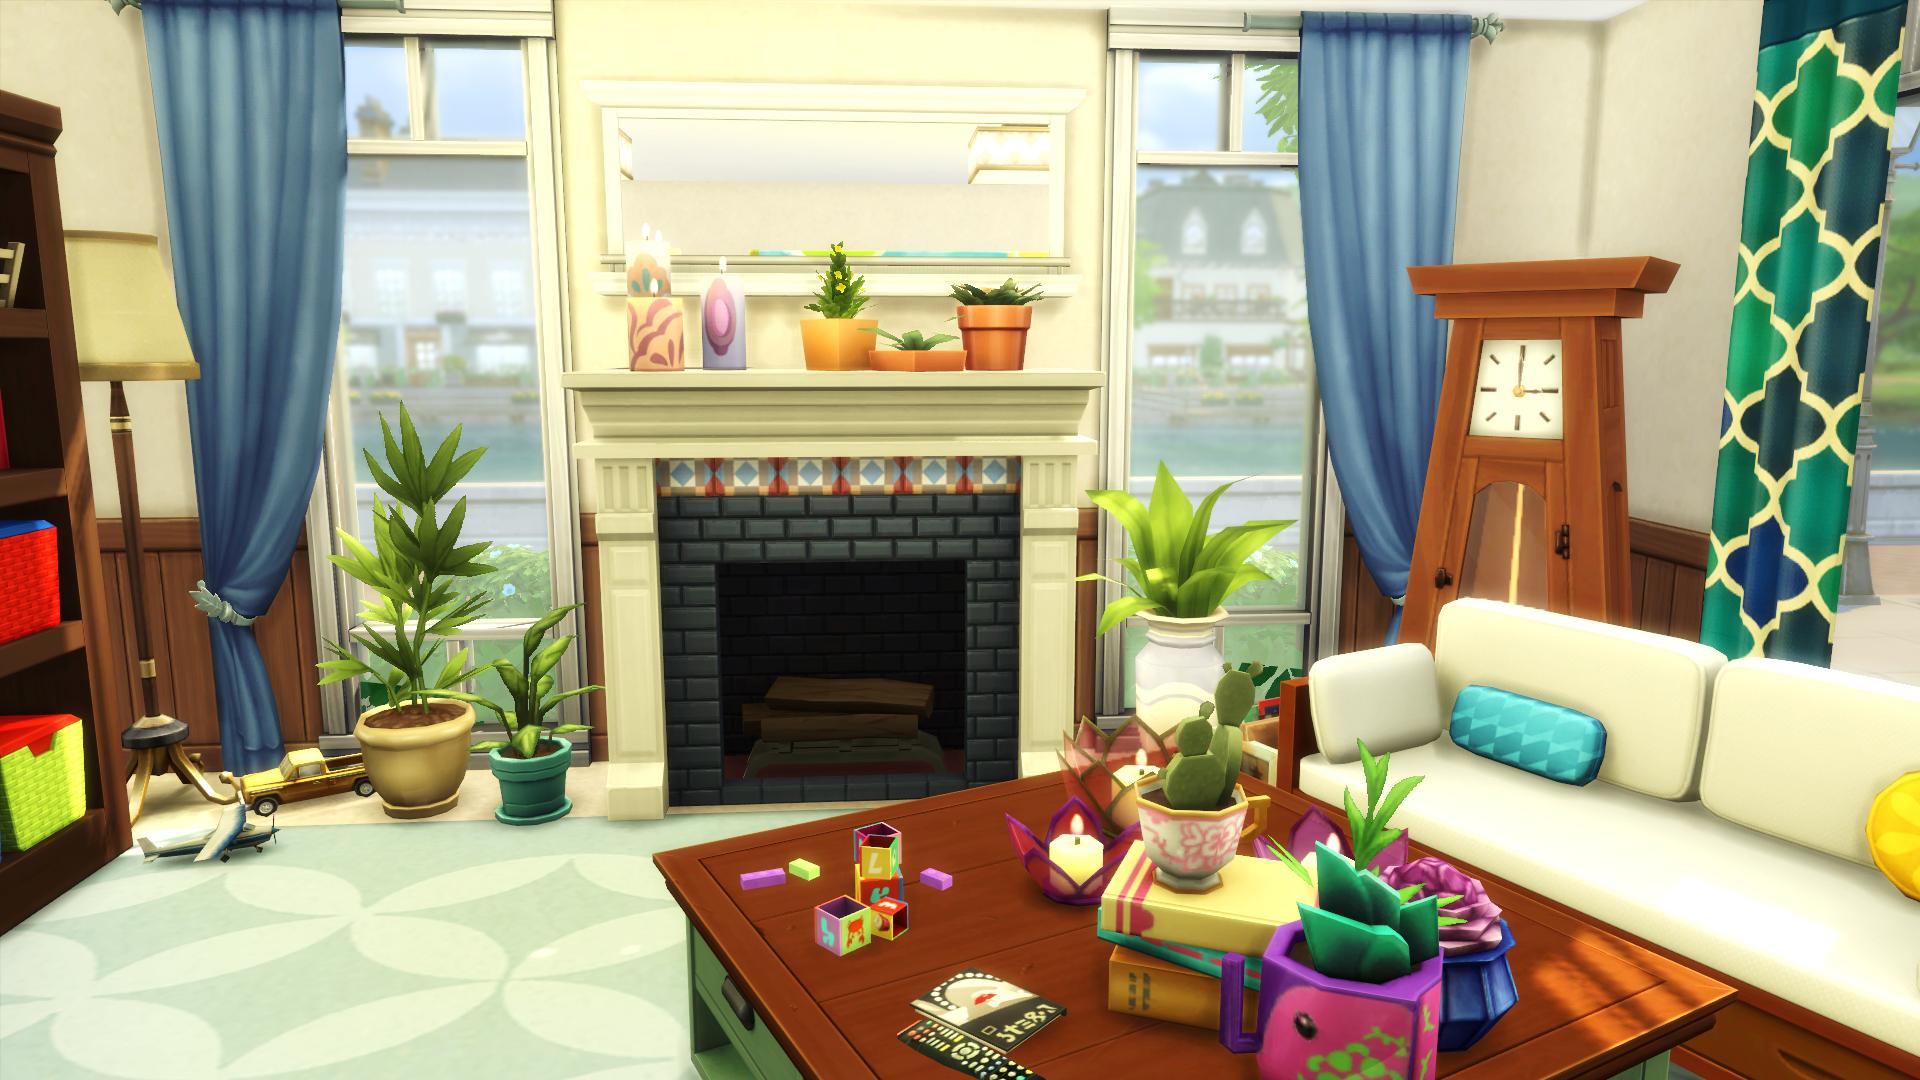 Mod The Sims - Family House - No CC